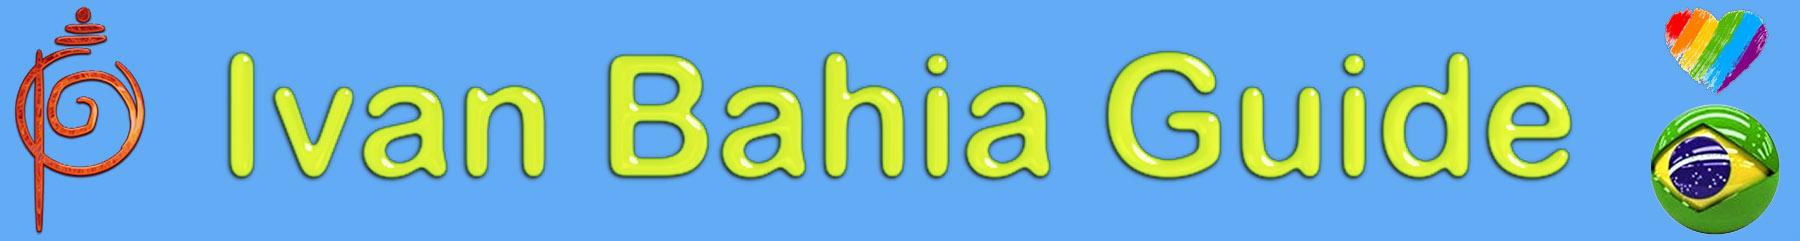 Discover Bahia with Ivan Bahia, travel agency in Salvador da Bahia, the original Capital of Brazil with TOP private tours & guides, your best experience (in English - Français - Nederlands) in Bahia, Chapada Diamantina National Park, All Saints Bay, Cachoeira, Recôncavo Baiano, Praia do Forte, Coconut coast and Bahia / NE-Brazil #ivanbahiaguide #ivansalvadorbahia #salvadorbahiabrazil #bahiatourism #fotoschapadadiamantina #ibg #ibtg #fotosbahia #salvadorbahiatravel #toursbylocals #ivanbahia #ibg #ibtg #chapadadiamantinatransfer #chapadadiamantina #chapadaexperience #lencoistomorrodesaopaulo #voyagebresil #bresilessentiel #salvadortourguide #chapadadiamantinatrekking #lencois #lençois #toursbahia #brazilhoneymoon #yourtourbrazil #yourtoursbrazil #ig_bahia #bahiatours #reconcavobaiano #bahiaguide  #citytoursalvador #bahiametisse #guidedetourismesalvadorbahiabresil #transatjacquesvabres #sailingbrazil #yourtoursbrazil #maurotours #bahiatopturismo #gaytravelbrazil  #transfersalvador #morrodopaiinacio #FotosChapadaDiamantina #BahiaTourism #SalvadorBahiaBrazil #FotosBahia #SalvadorBahiaTravel #tripadvisorsalvador #tripadvisorbahia #bahiatour #toursbahia #bahiatravel #salvadortourguide #voyageraprescovid19 #voyagesaprescovid19 #voyageaprescovid19